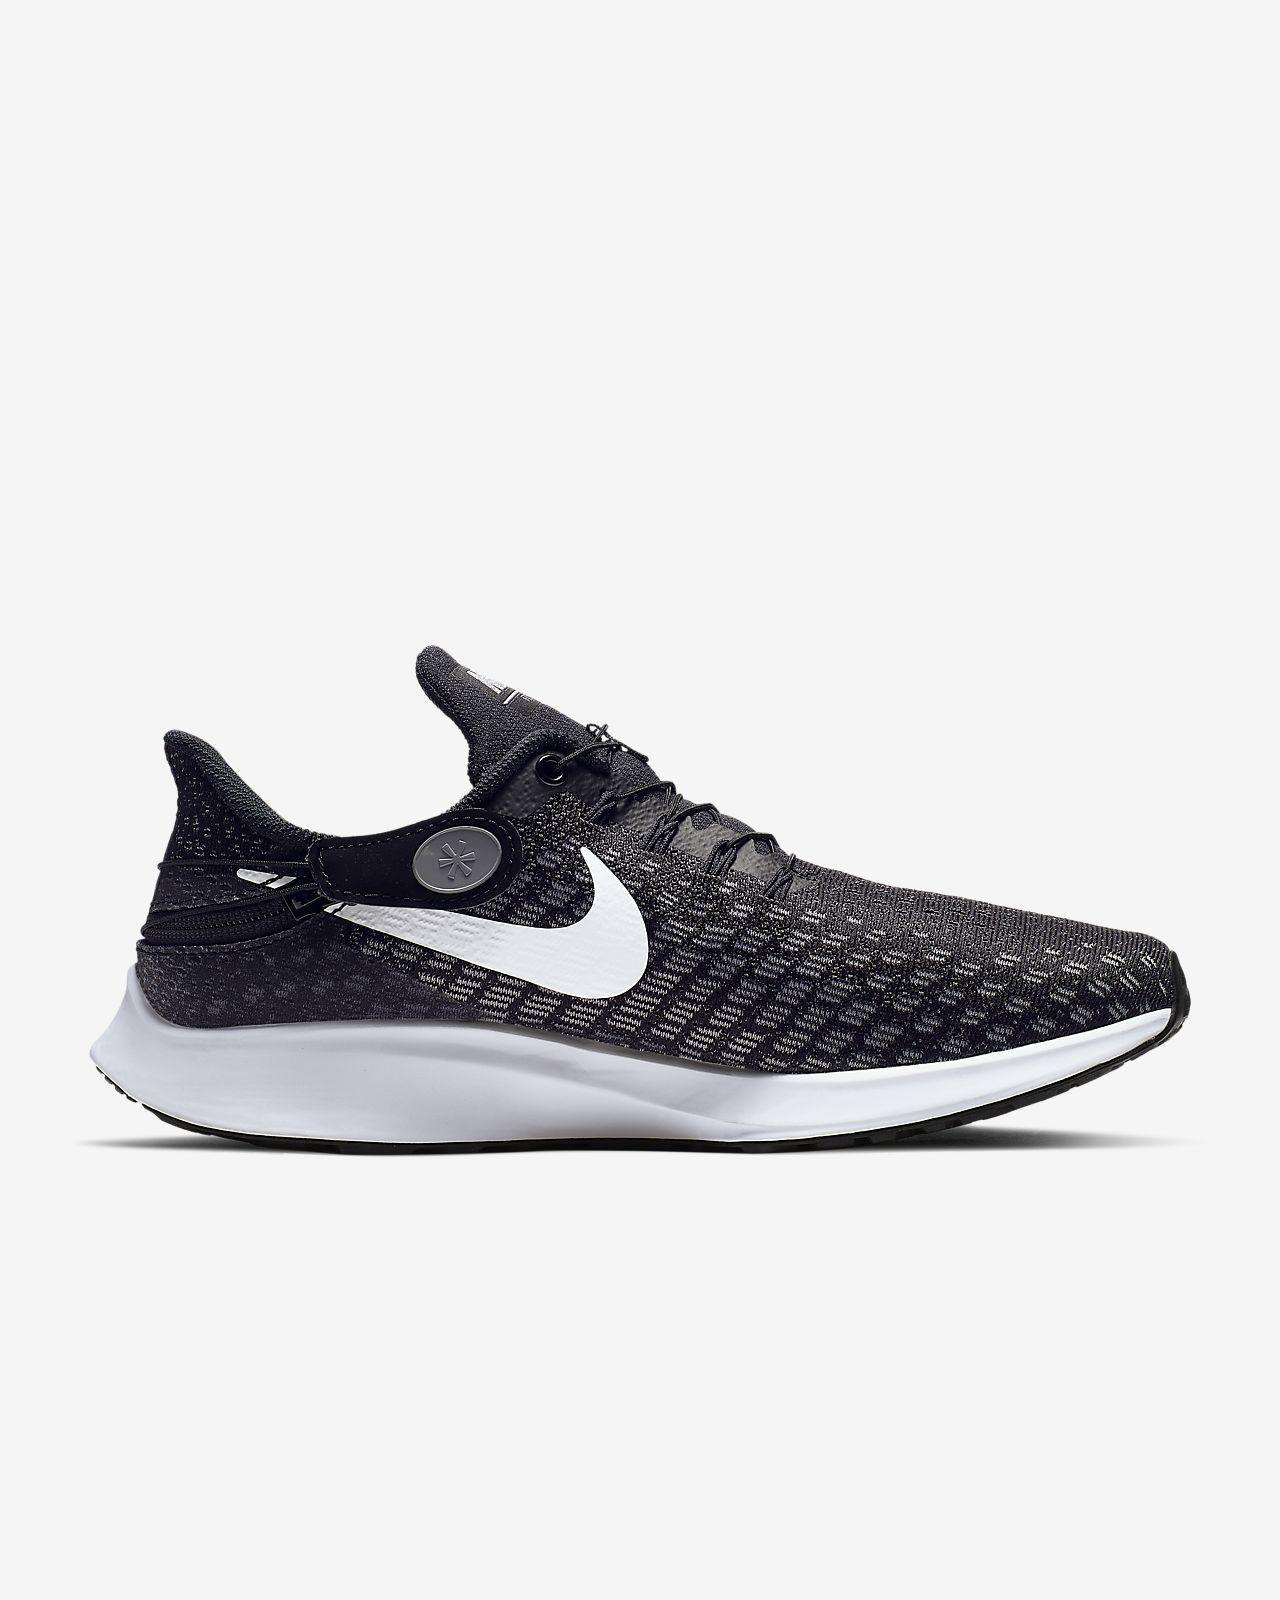 857a83f7e88a Nike Air Zoom Pegasus 35 FlyEase Women s Running Shoe. Nike.com VN